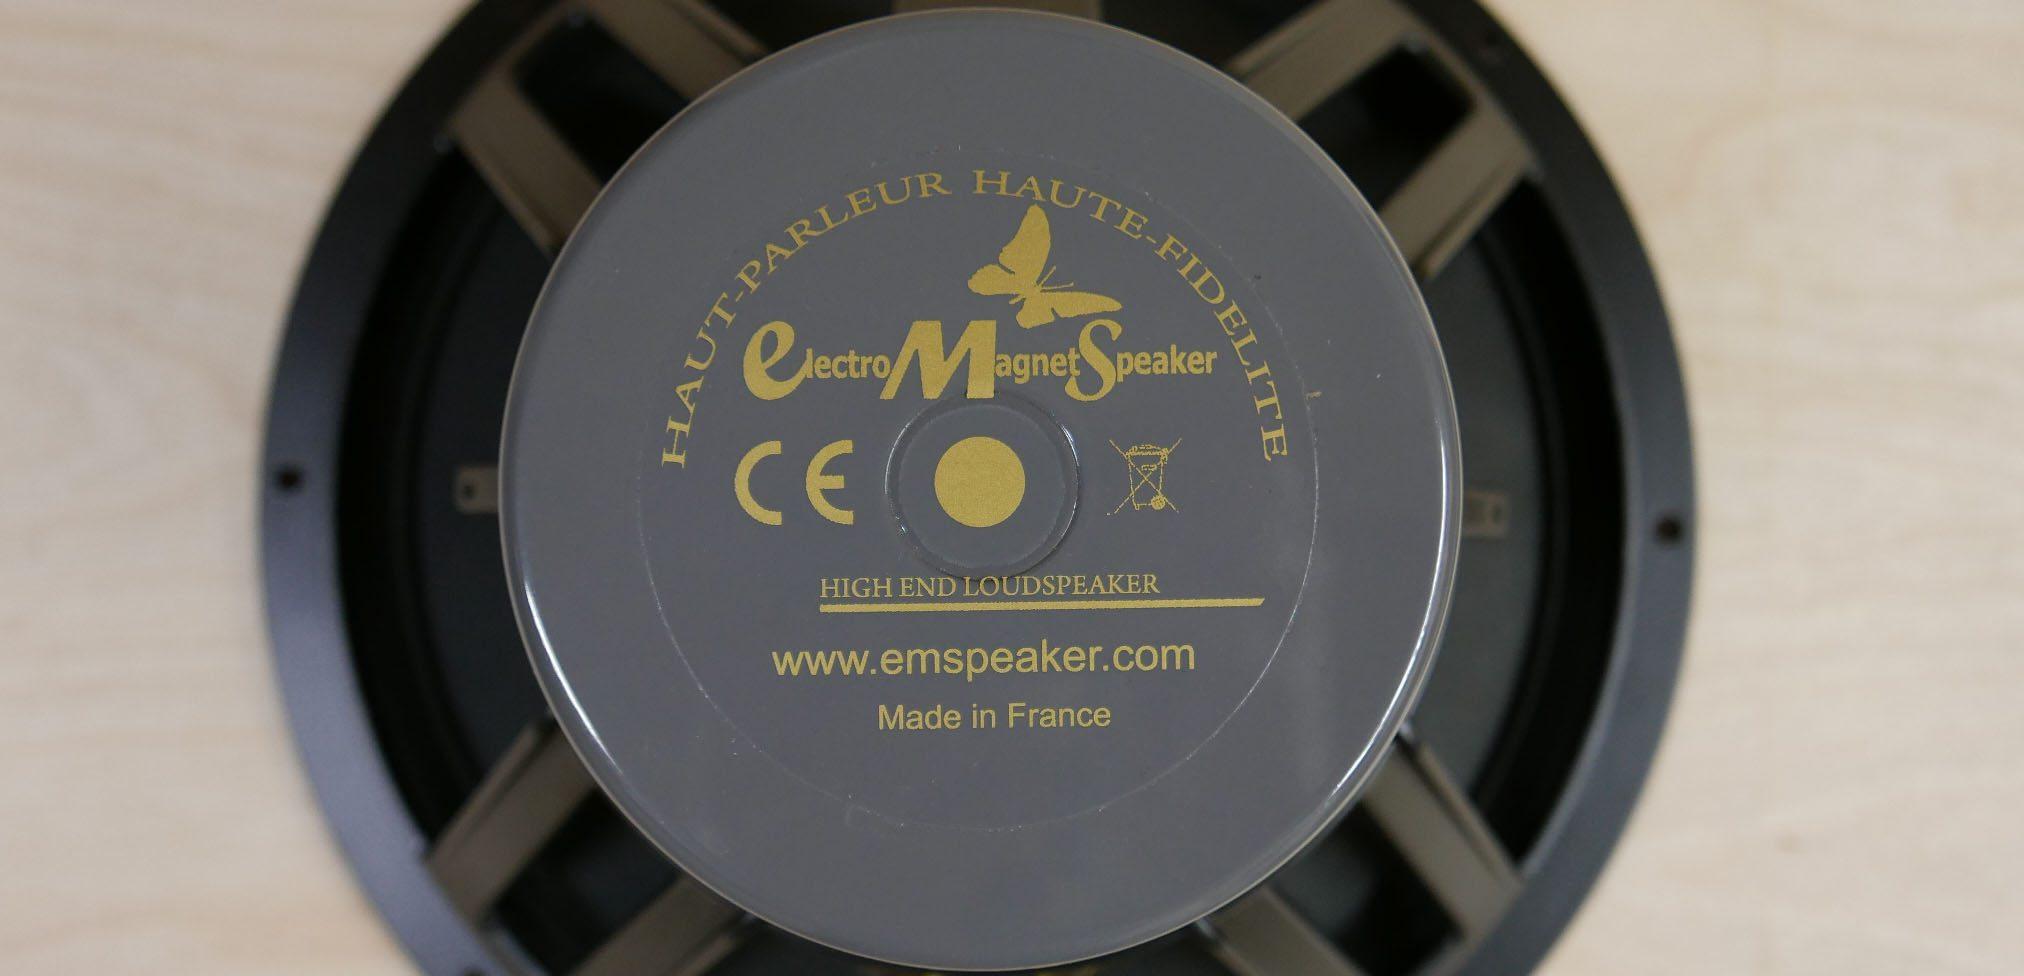 Electro Magnet Speaker